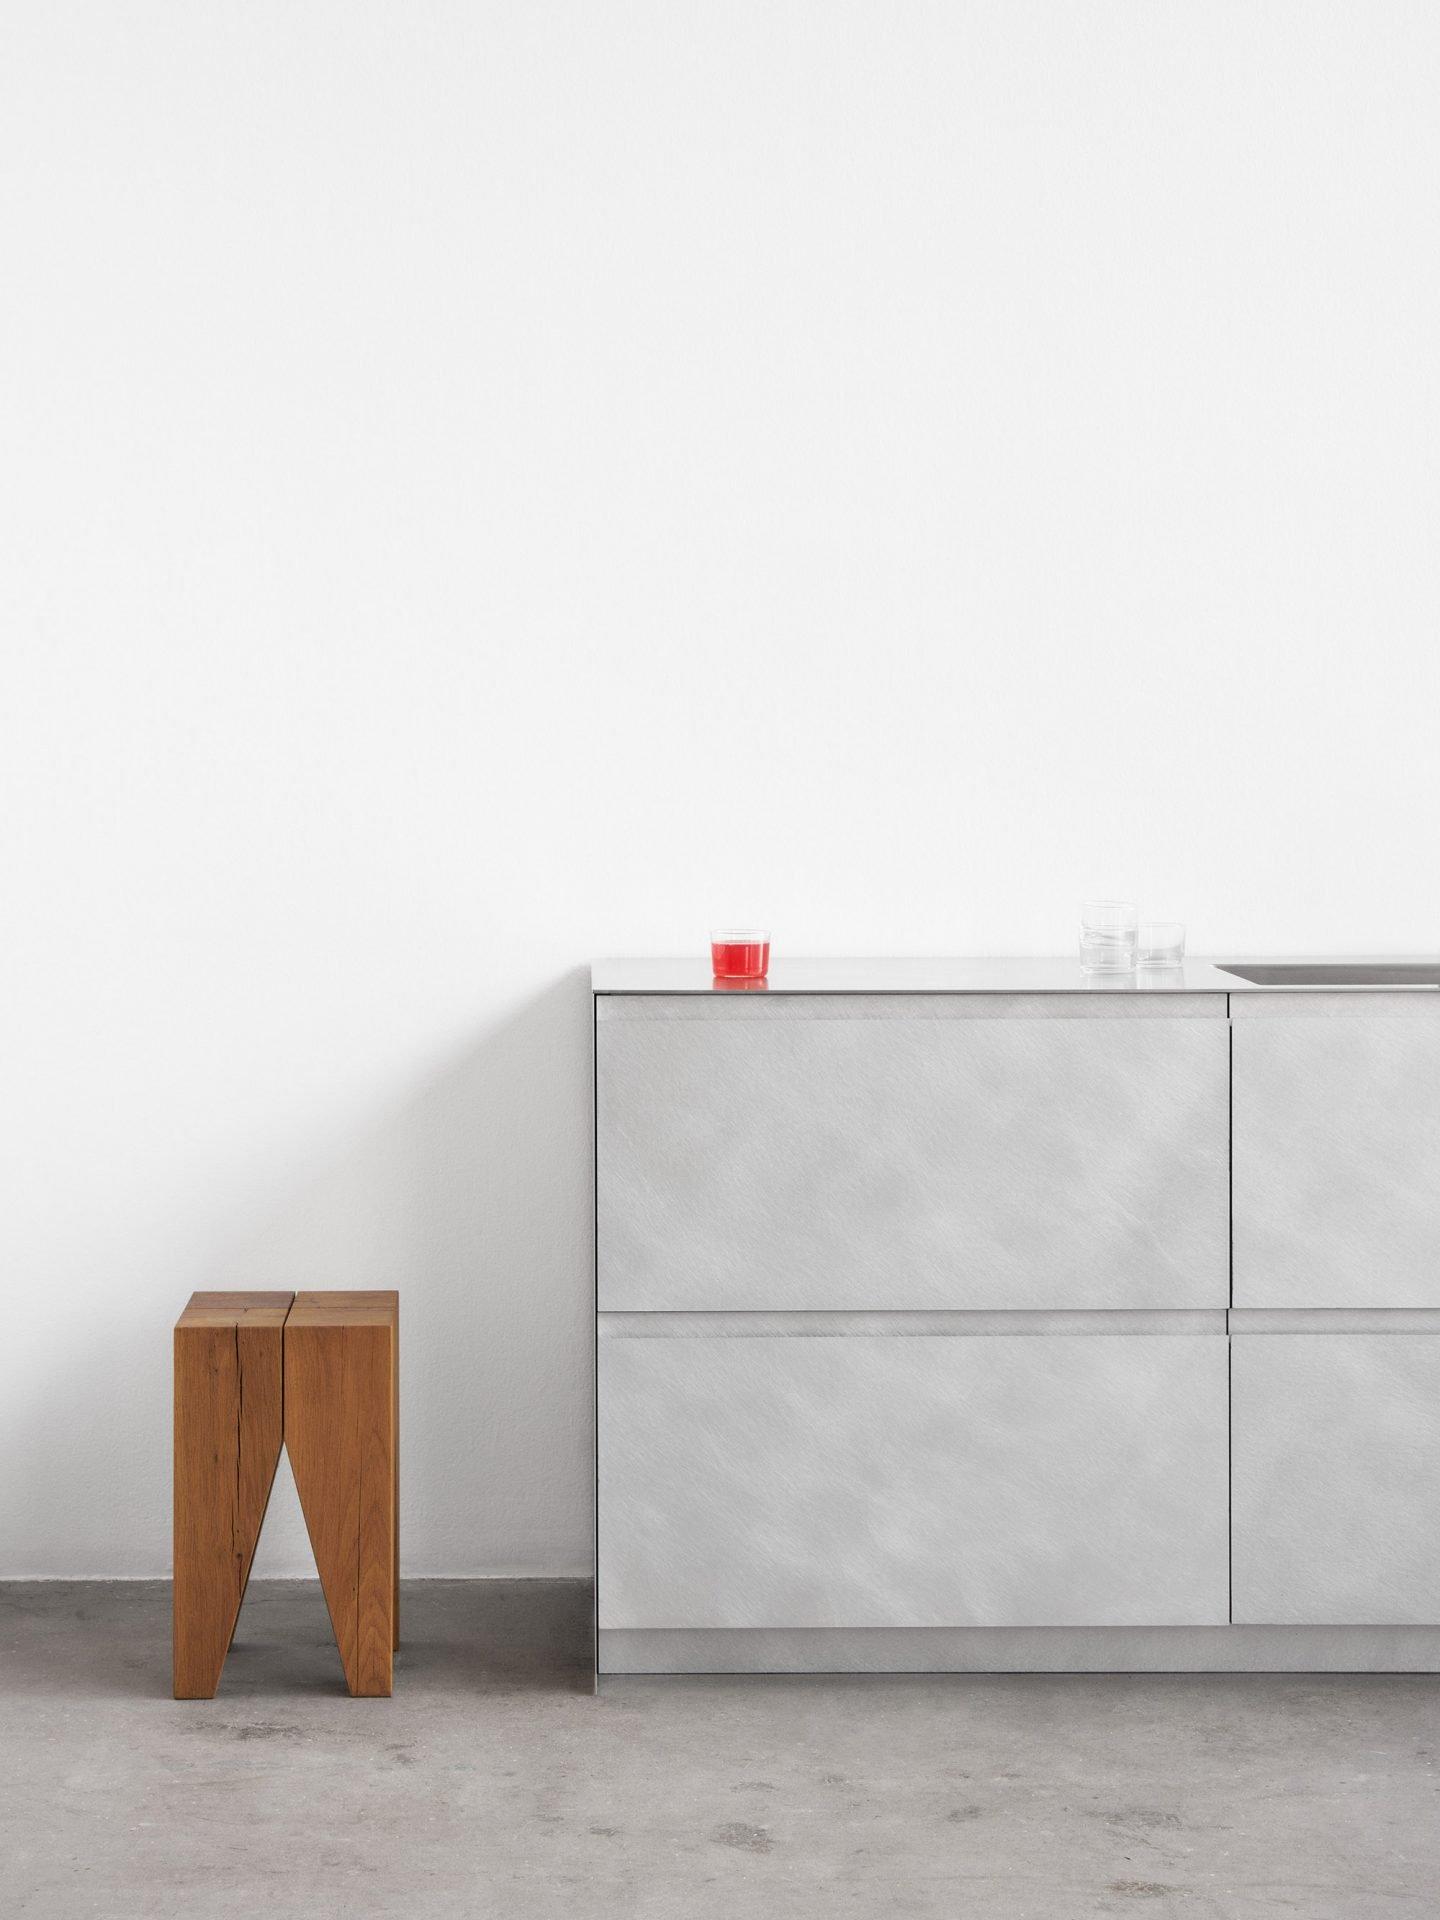 IGNANT-Design-Reform-PLATE-DavidThulstrup-04